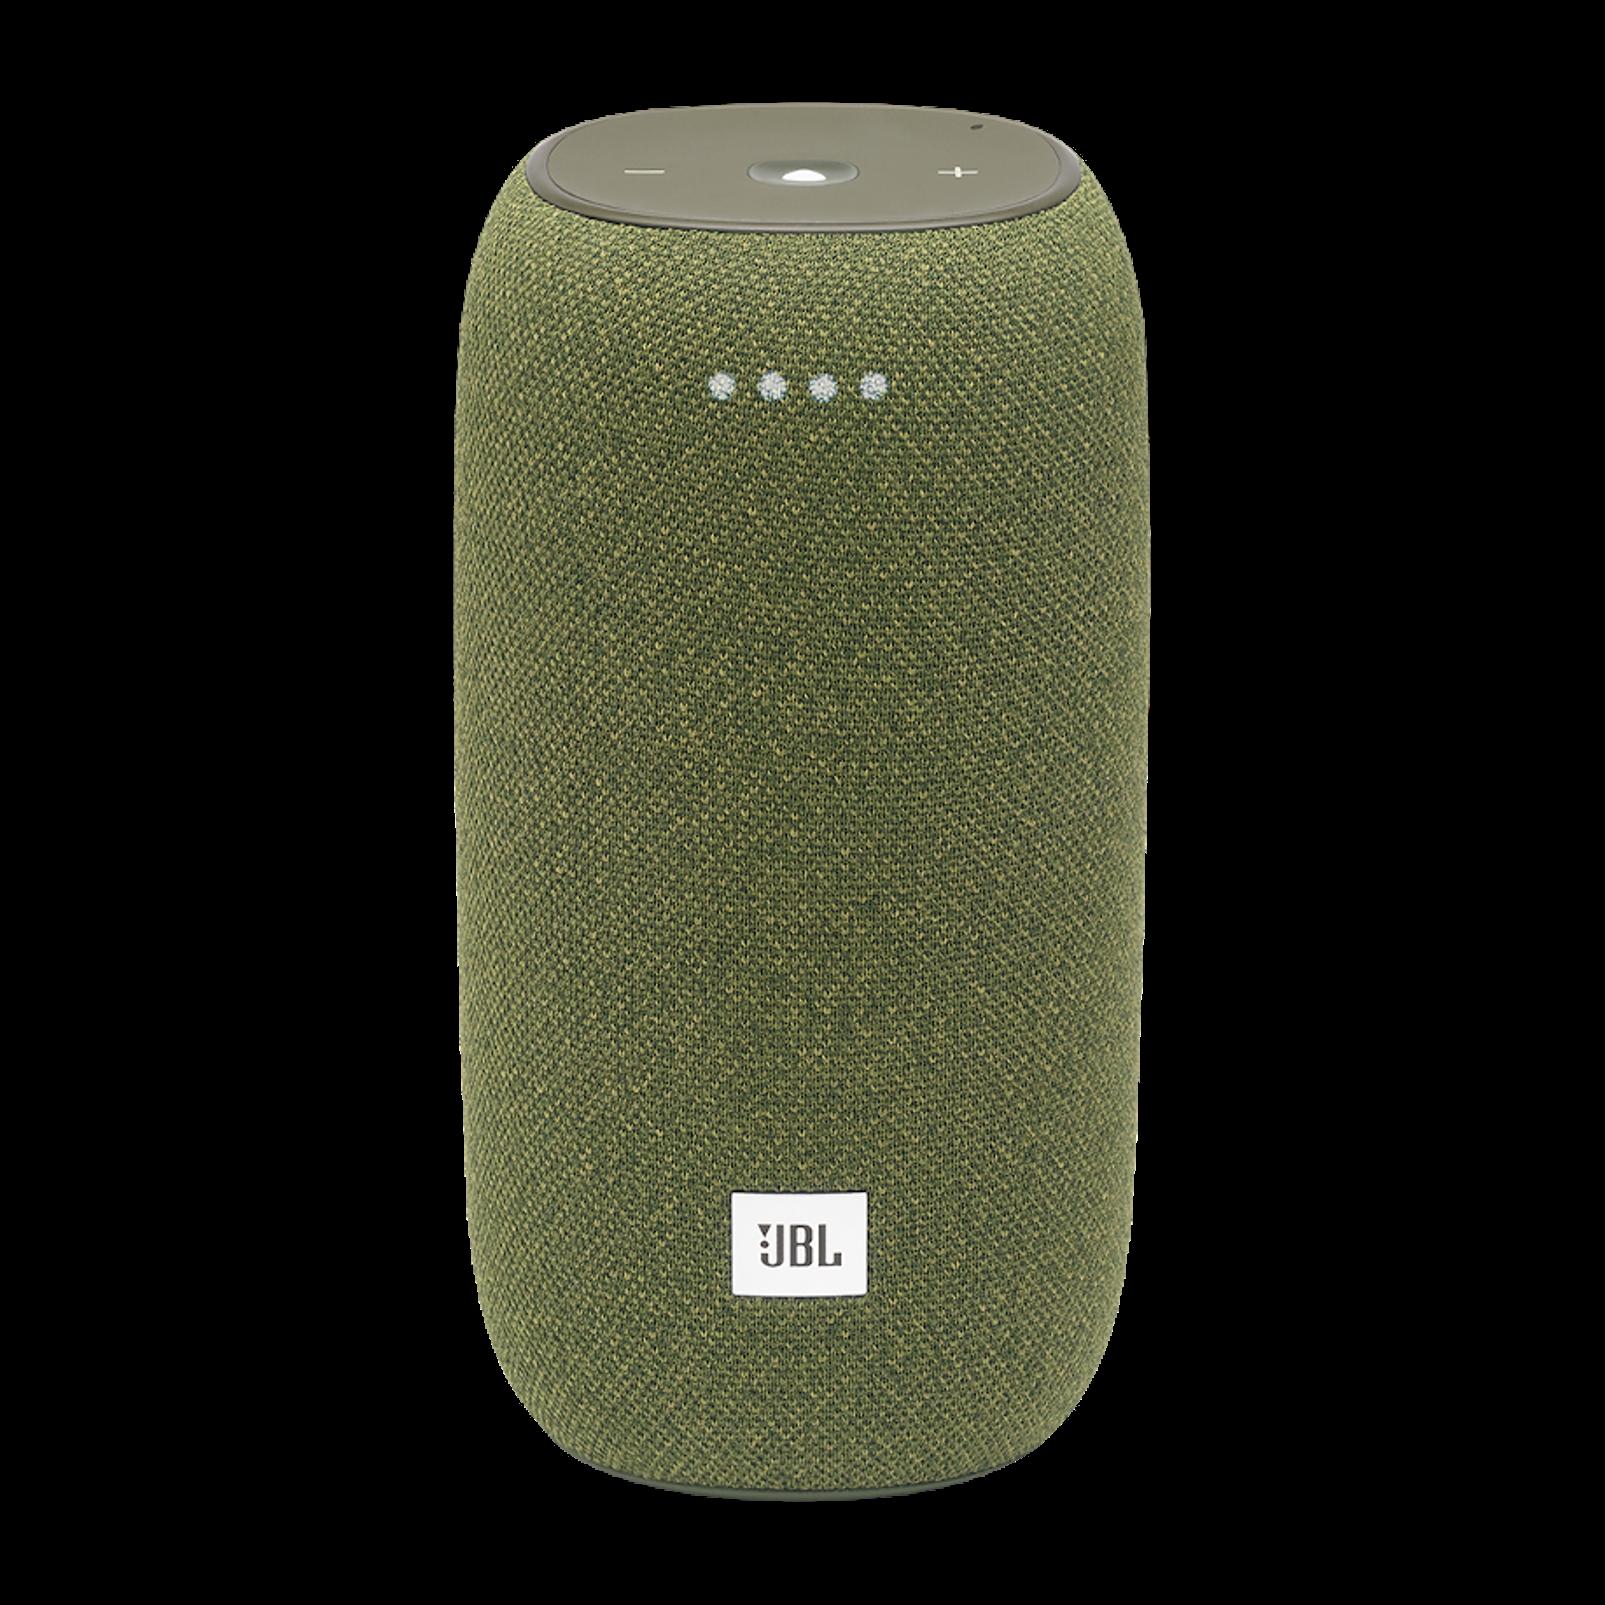 Link Portable Yandex - Green - Hero